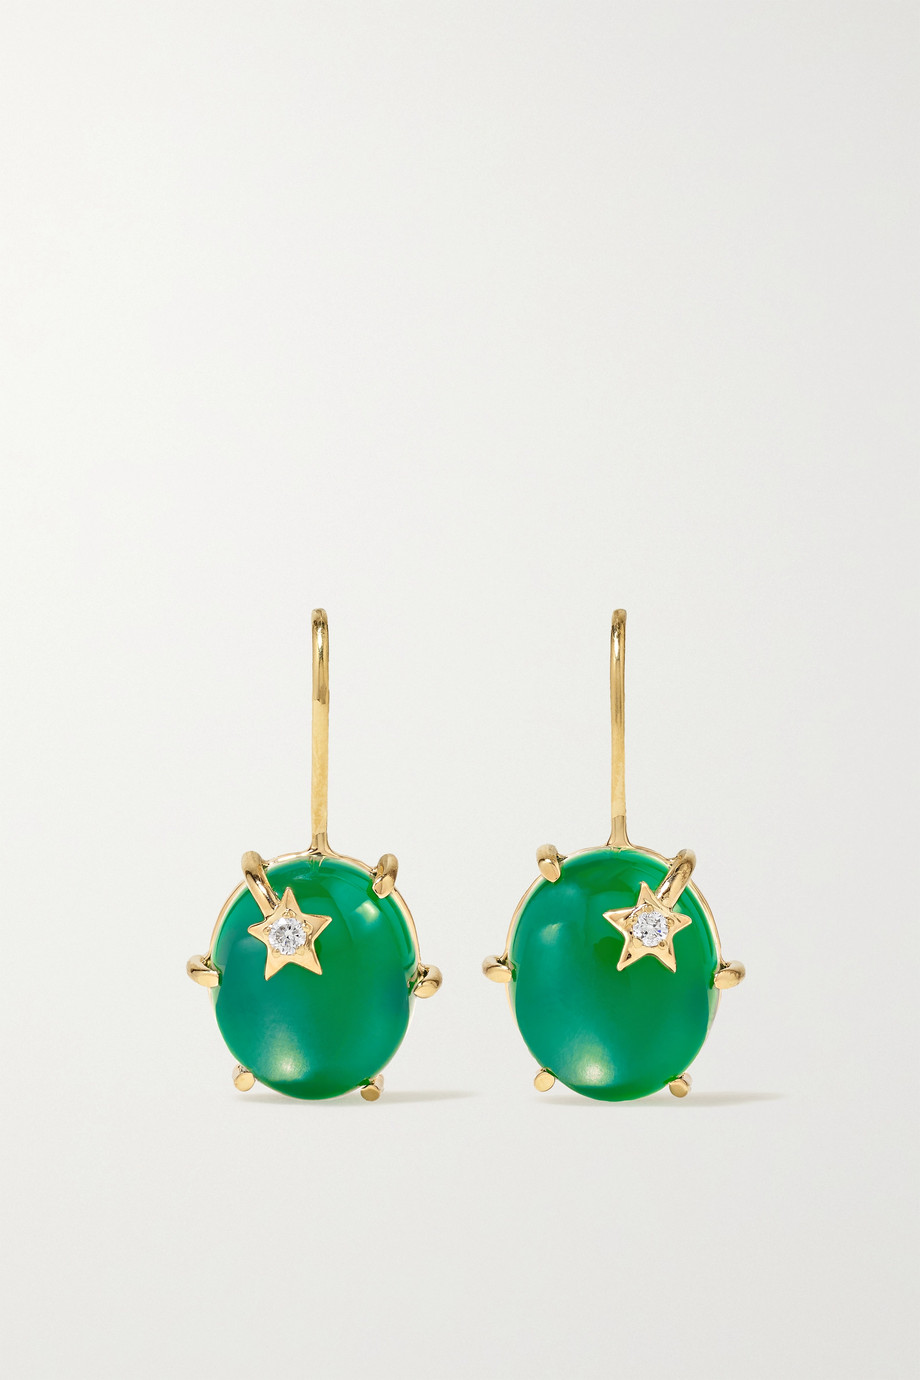 Andrea Fohrman Mini Galaxy 18-karat gold, onyx and diamond earrings